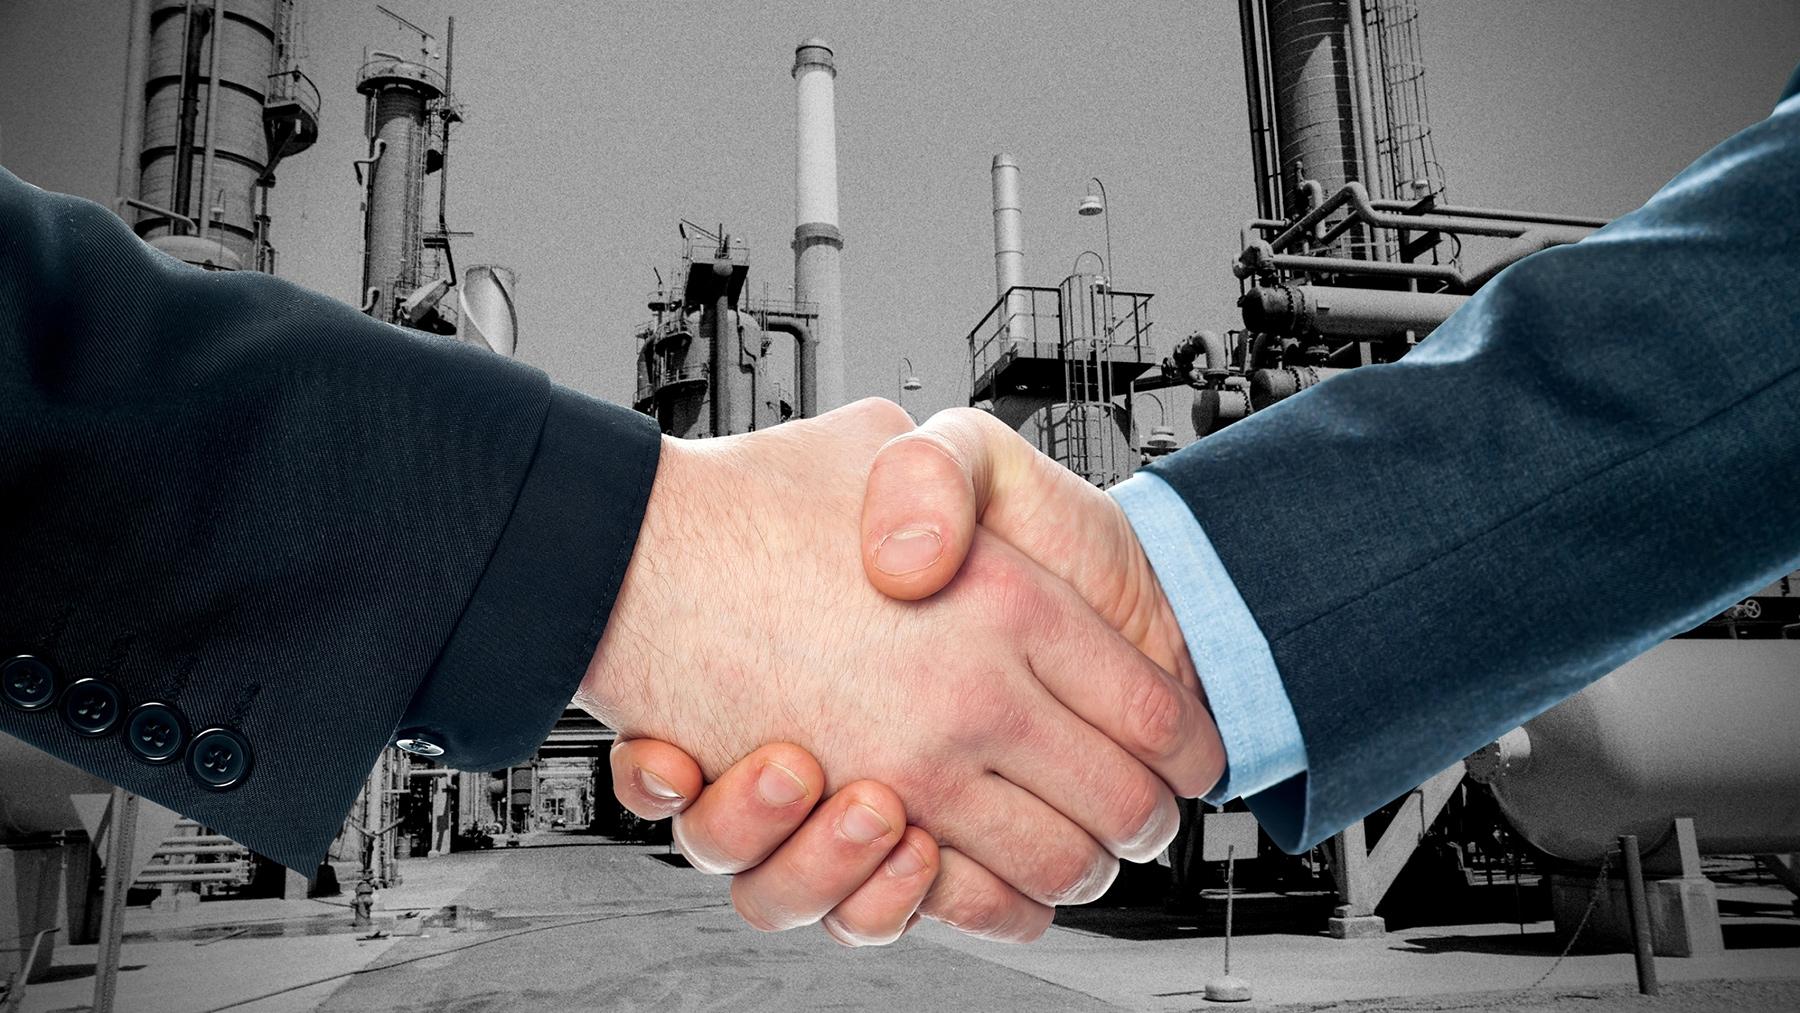 Handshake over image of oil refinery